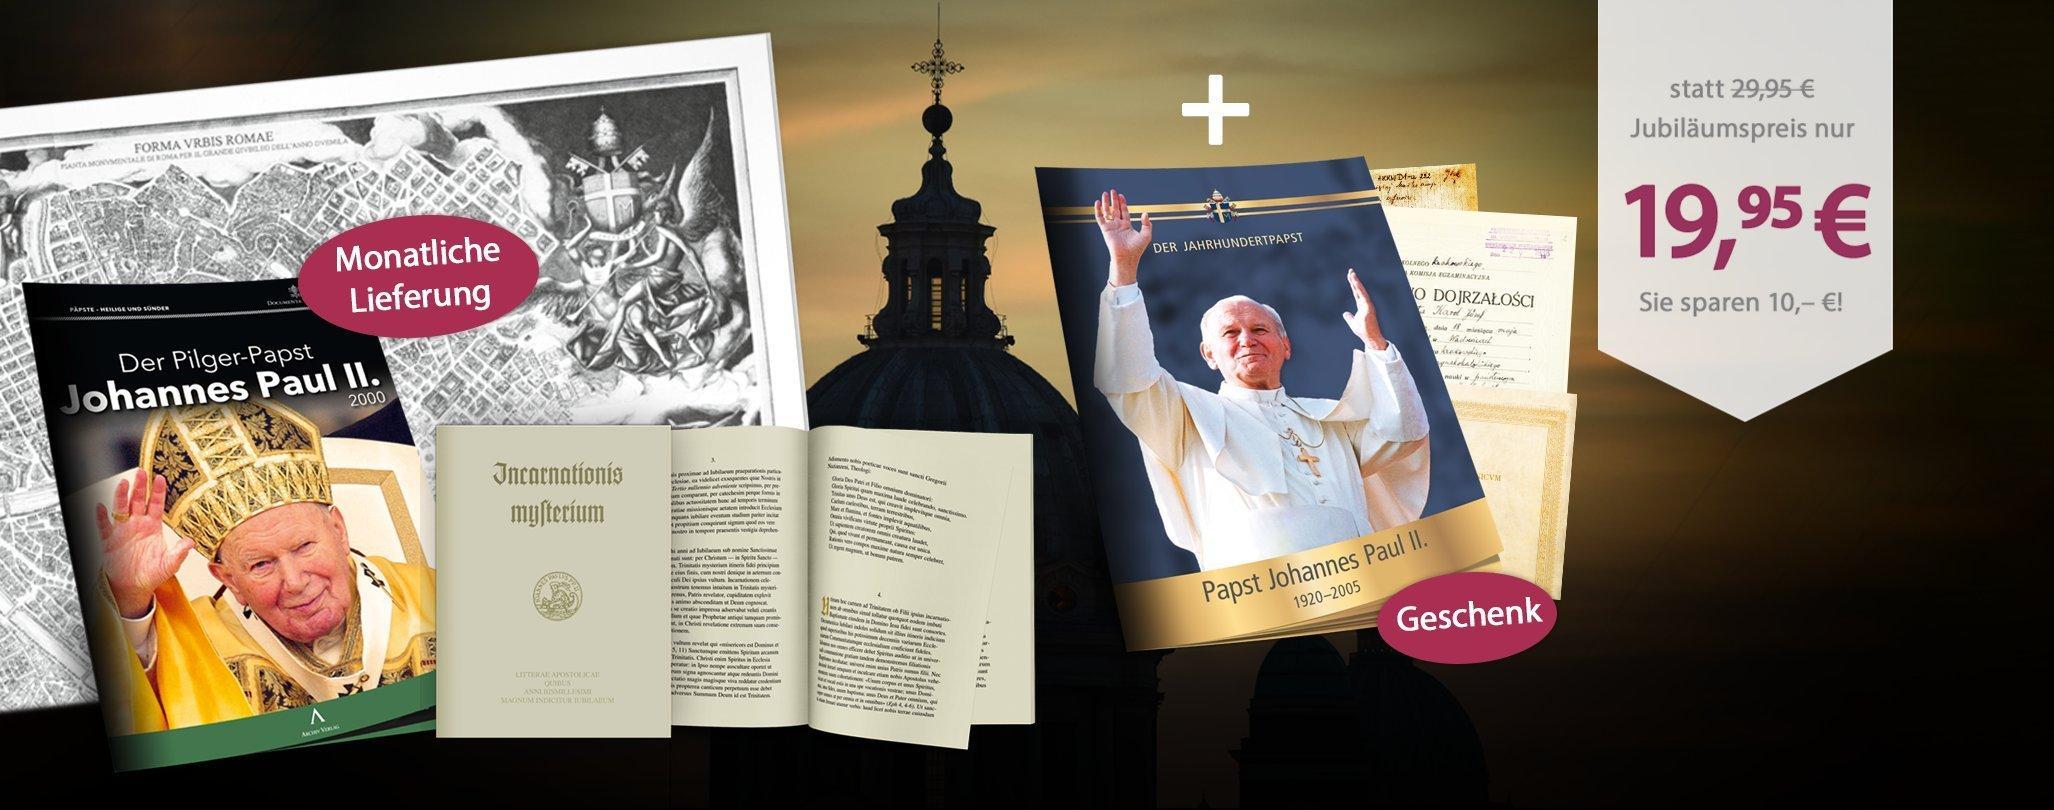 MDM - Documenta Vaticana – Der Pilger-Papst Johannes Paul II.